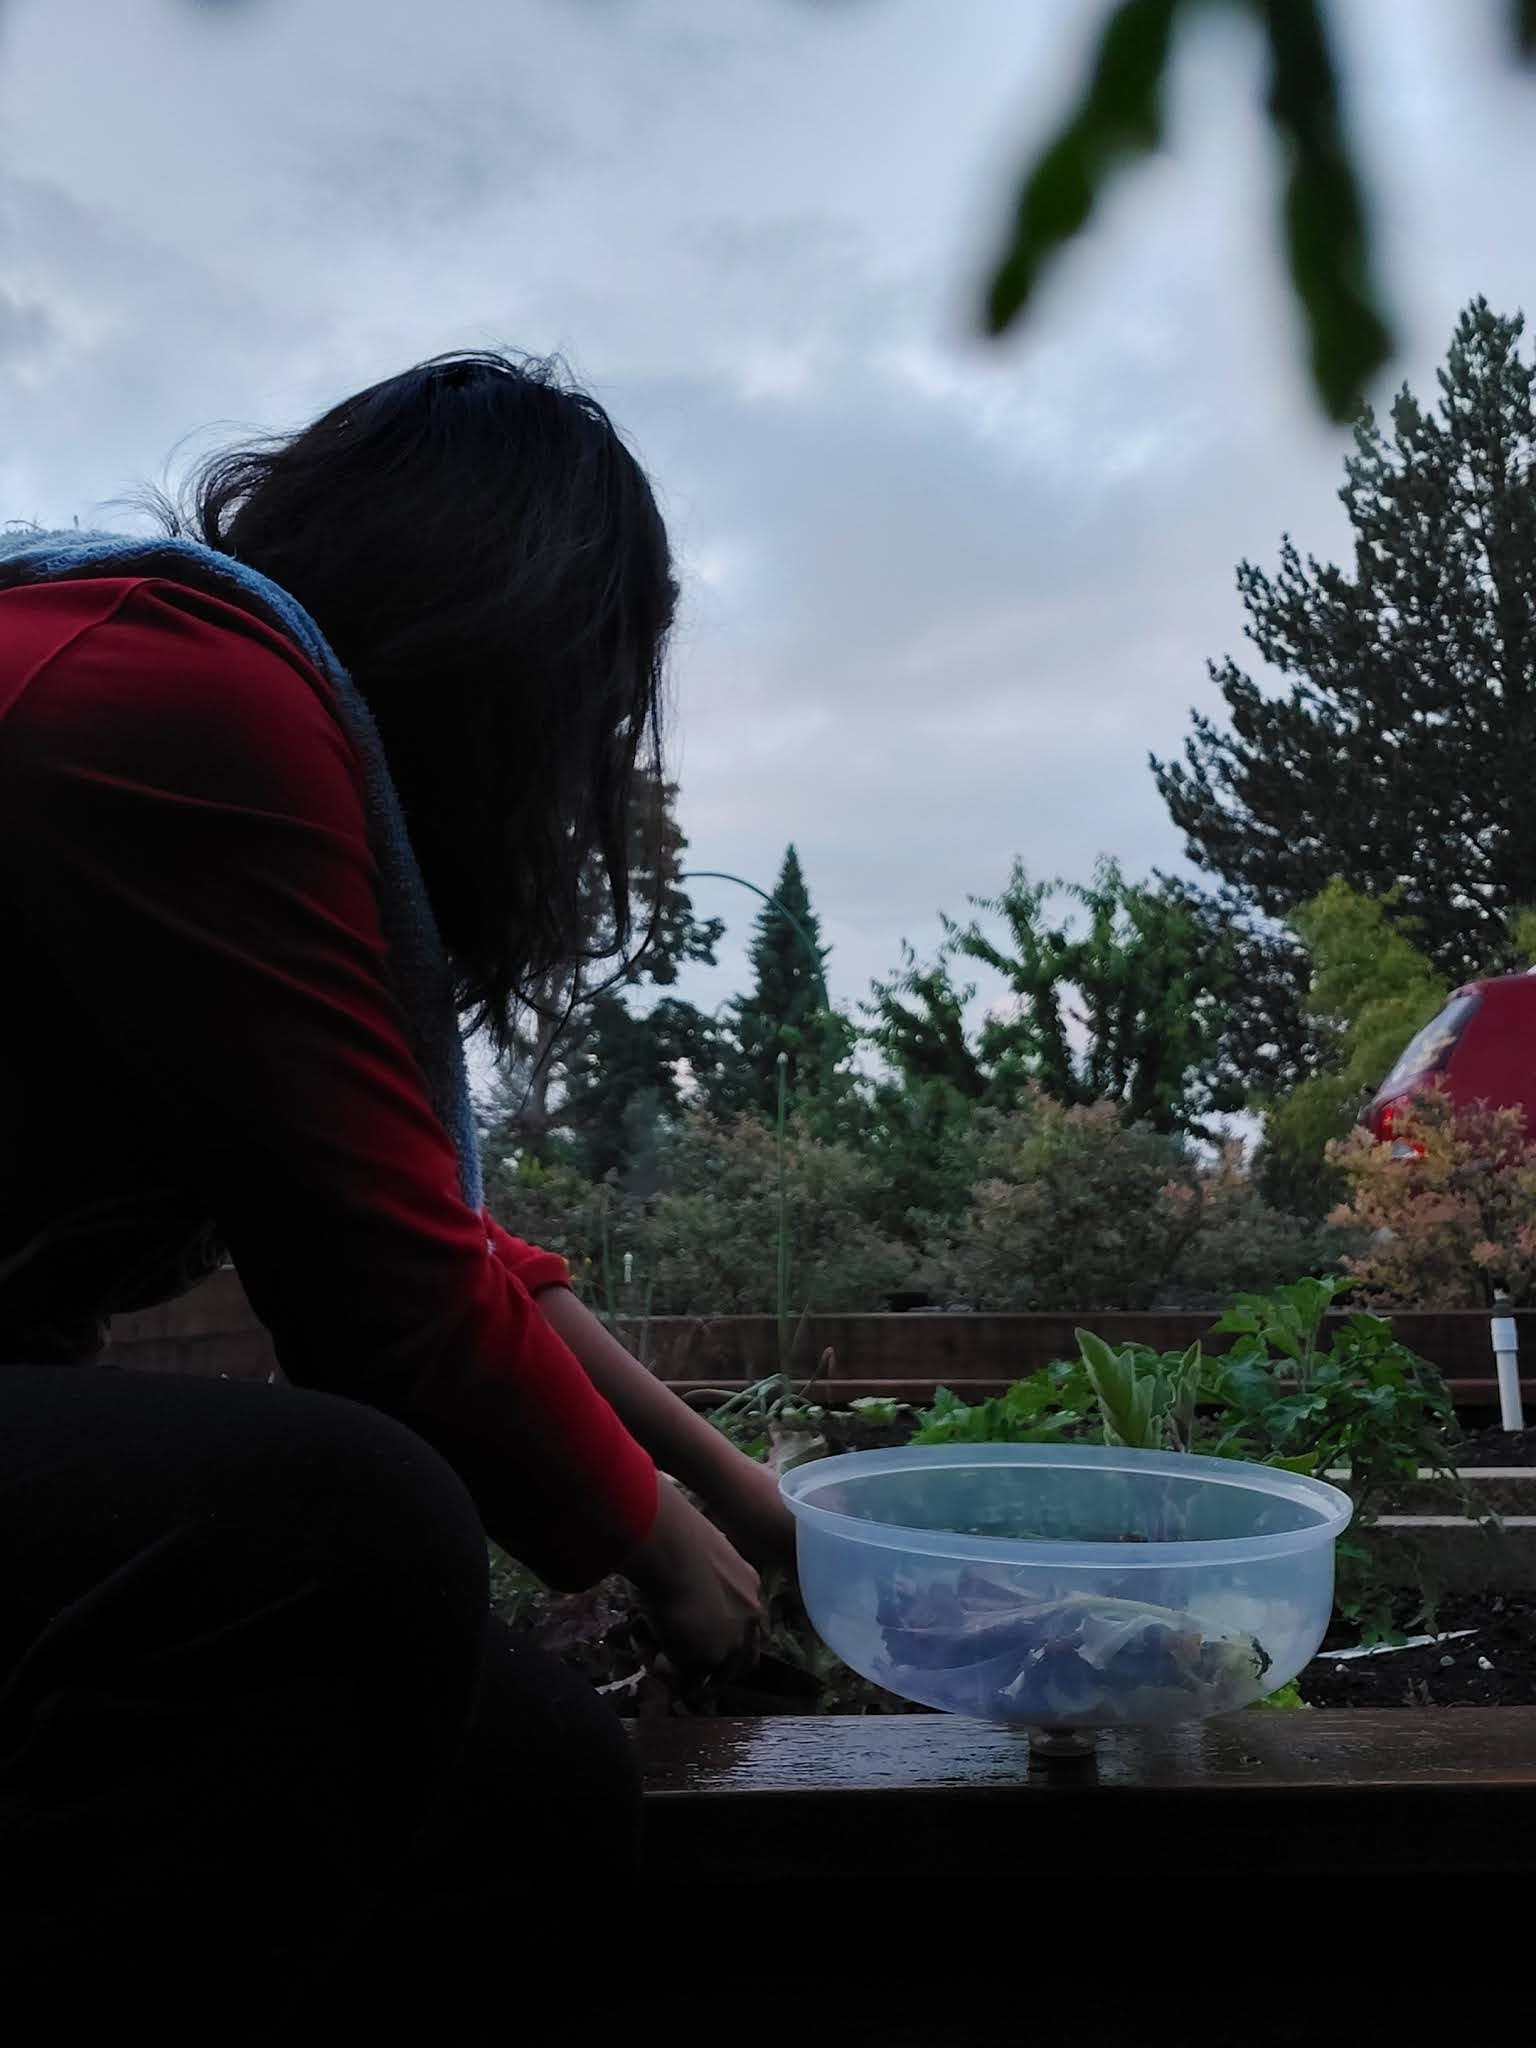 Harveting my lettuce in the garden